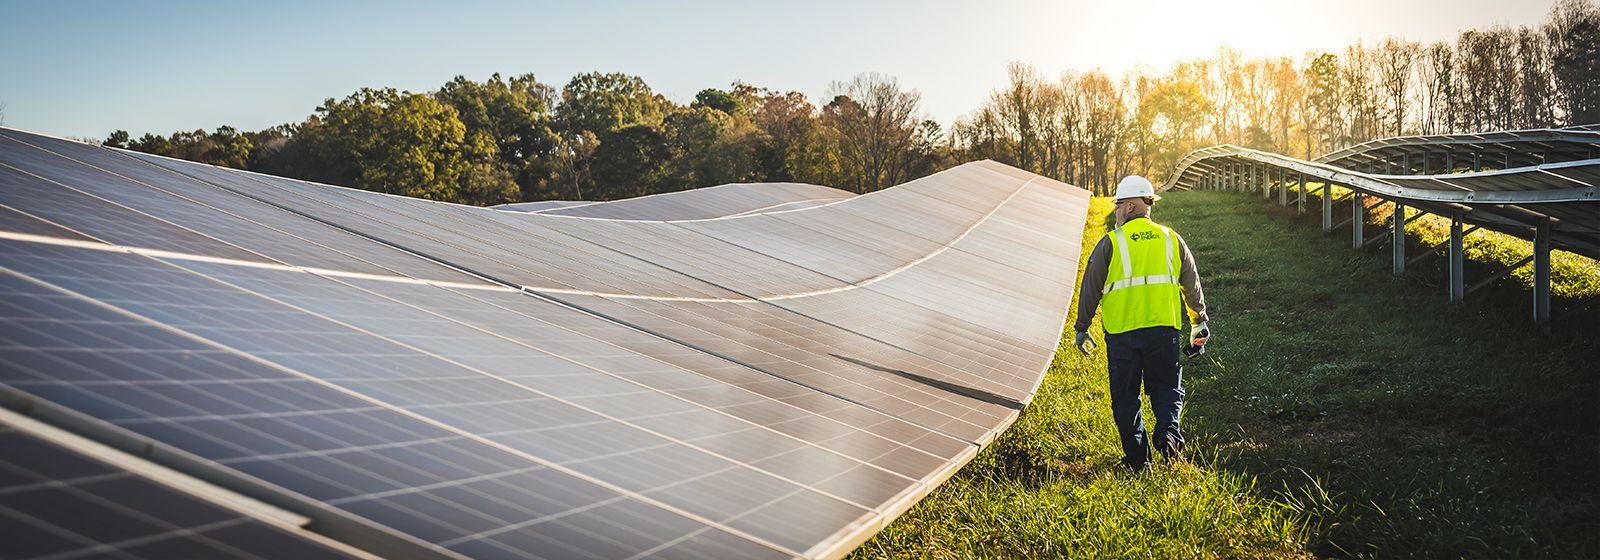 New Texas solar site helps Duke Energy reach renewable energy milestone